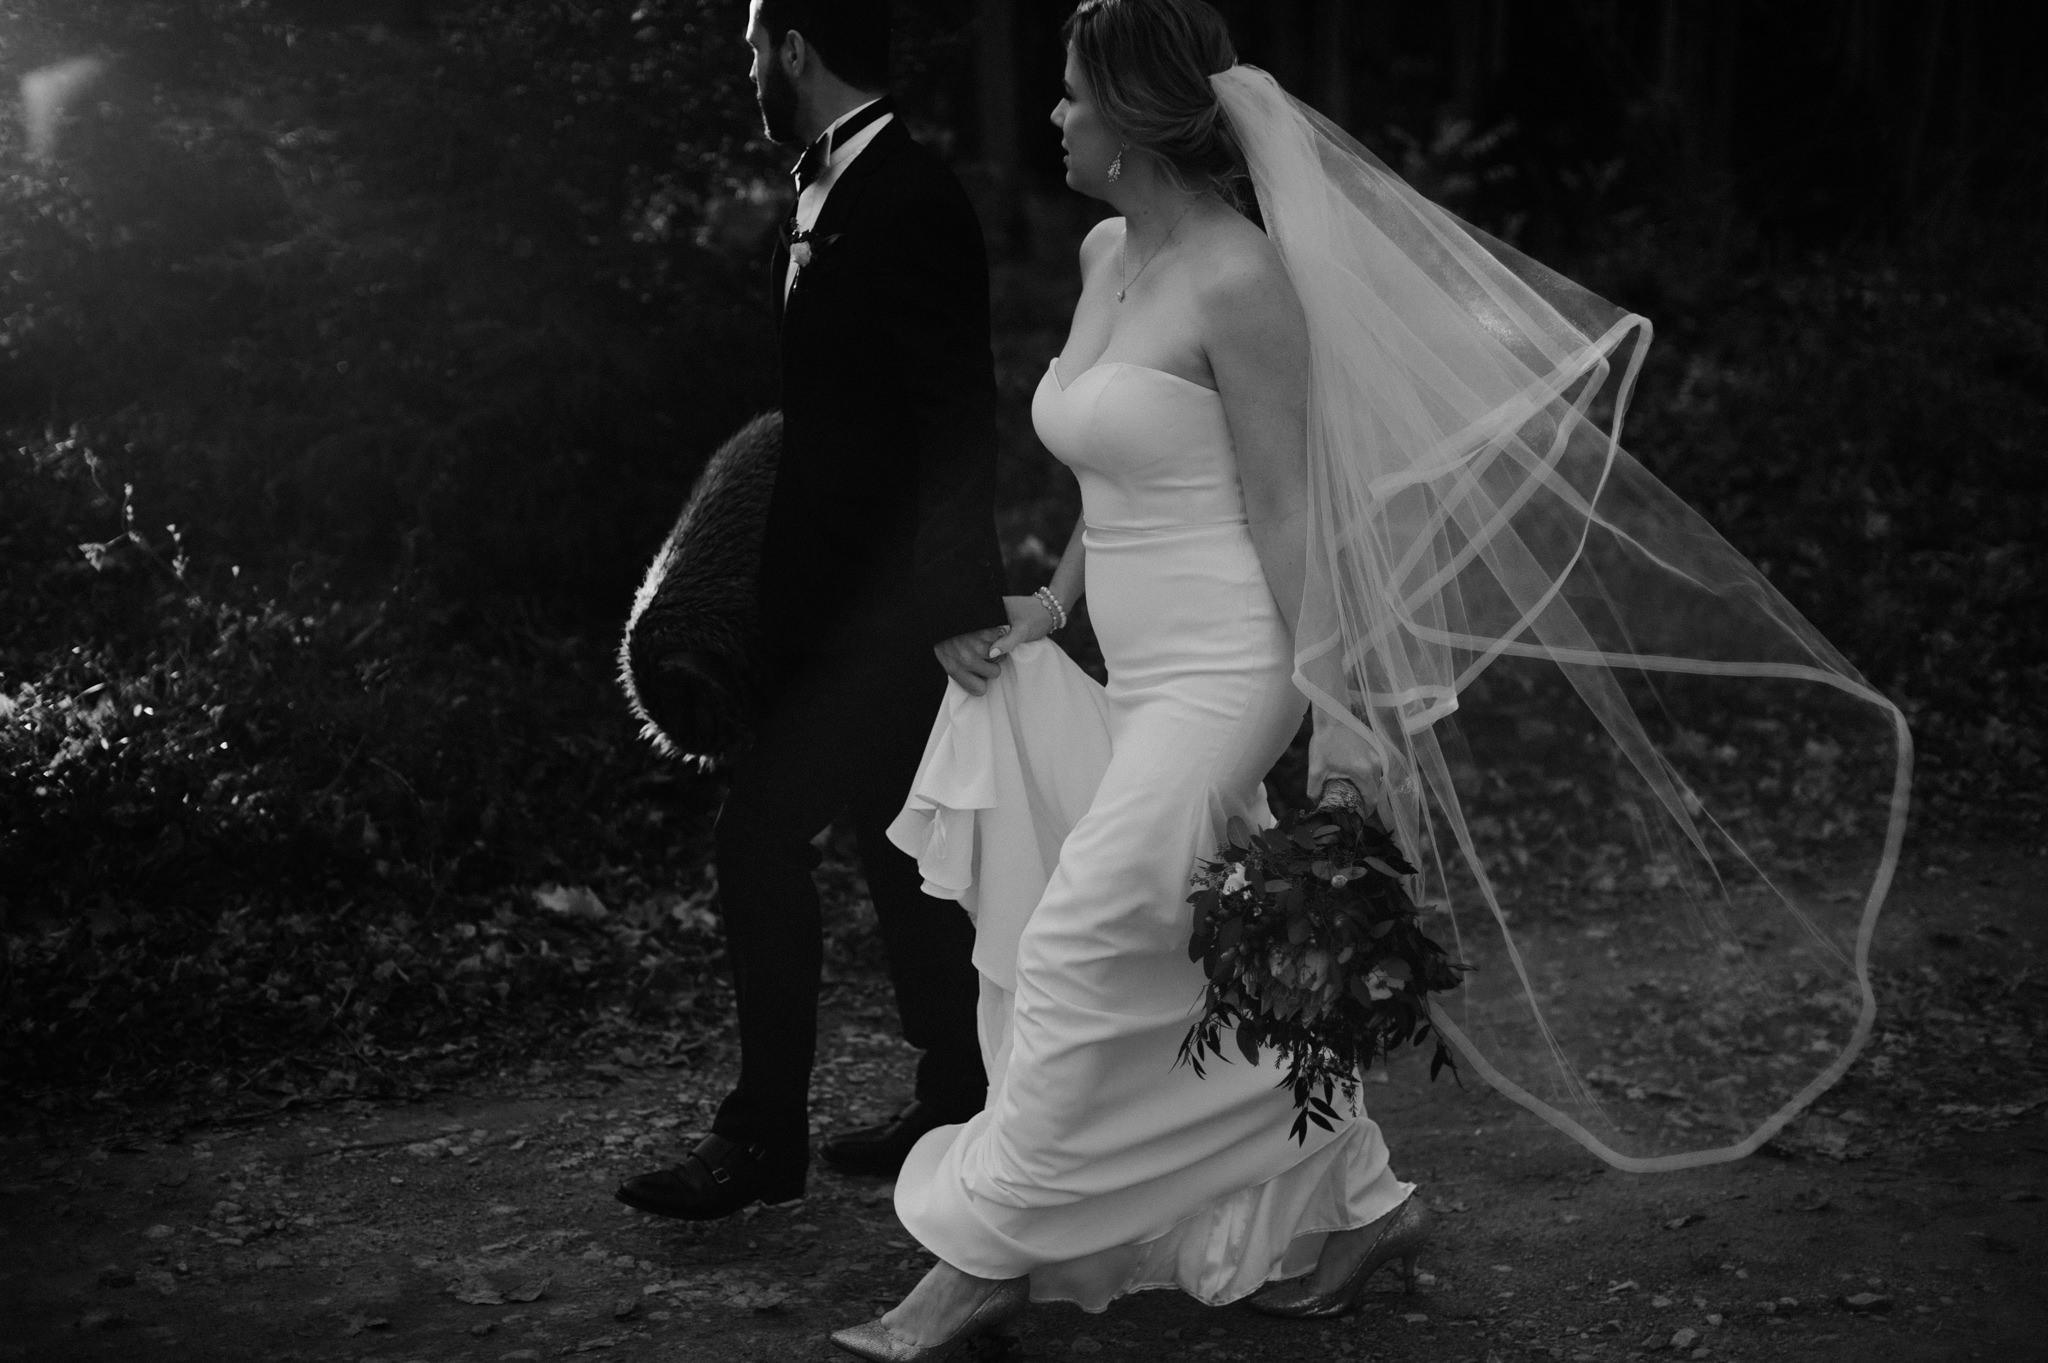 Intimate Cottage Wedding at Serenity Cottage in Owen Sound // Toronto wedding photographer Daring Wanderer